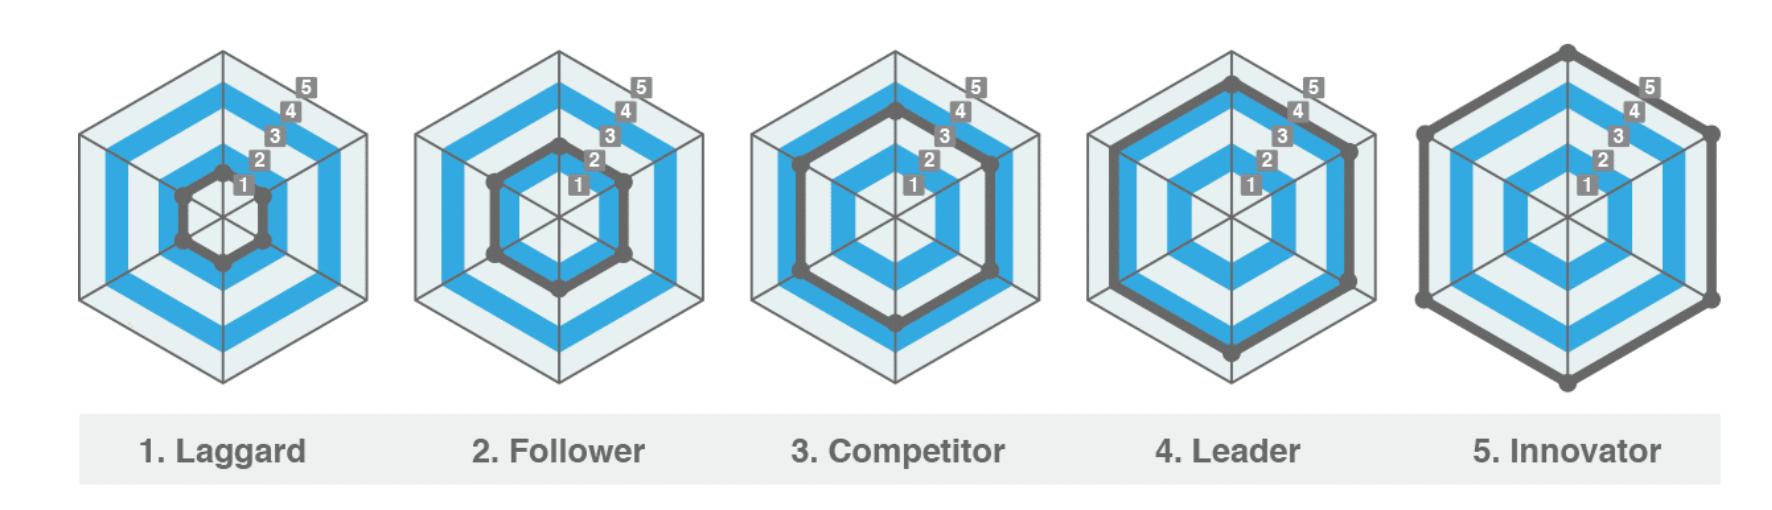 stages of analytics maturity